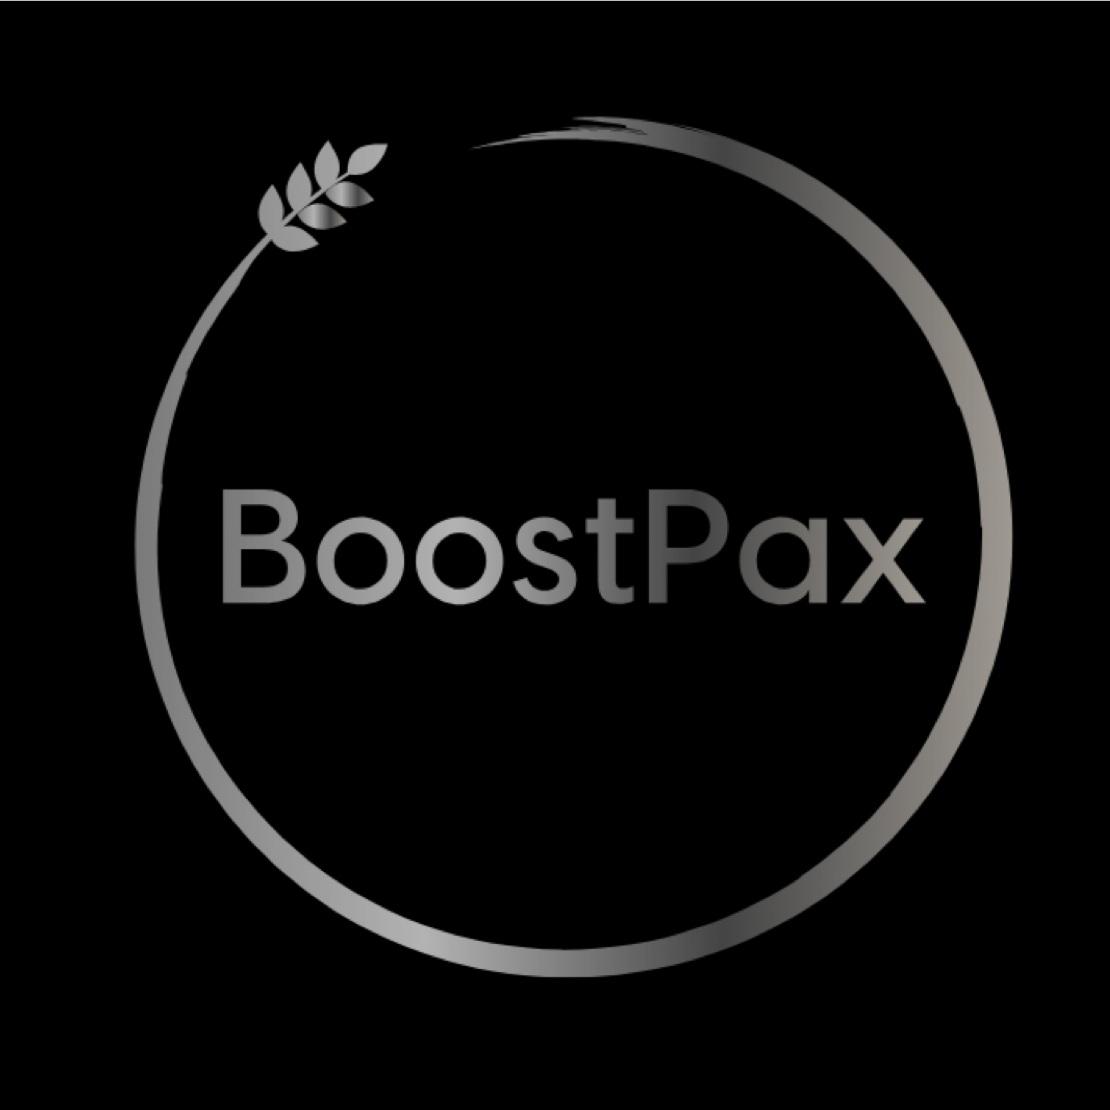 BoostPax.jpg